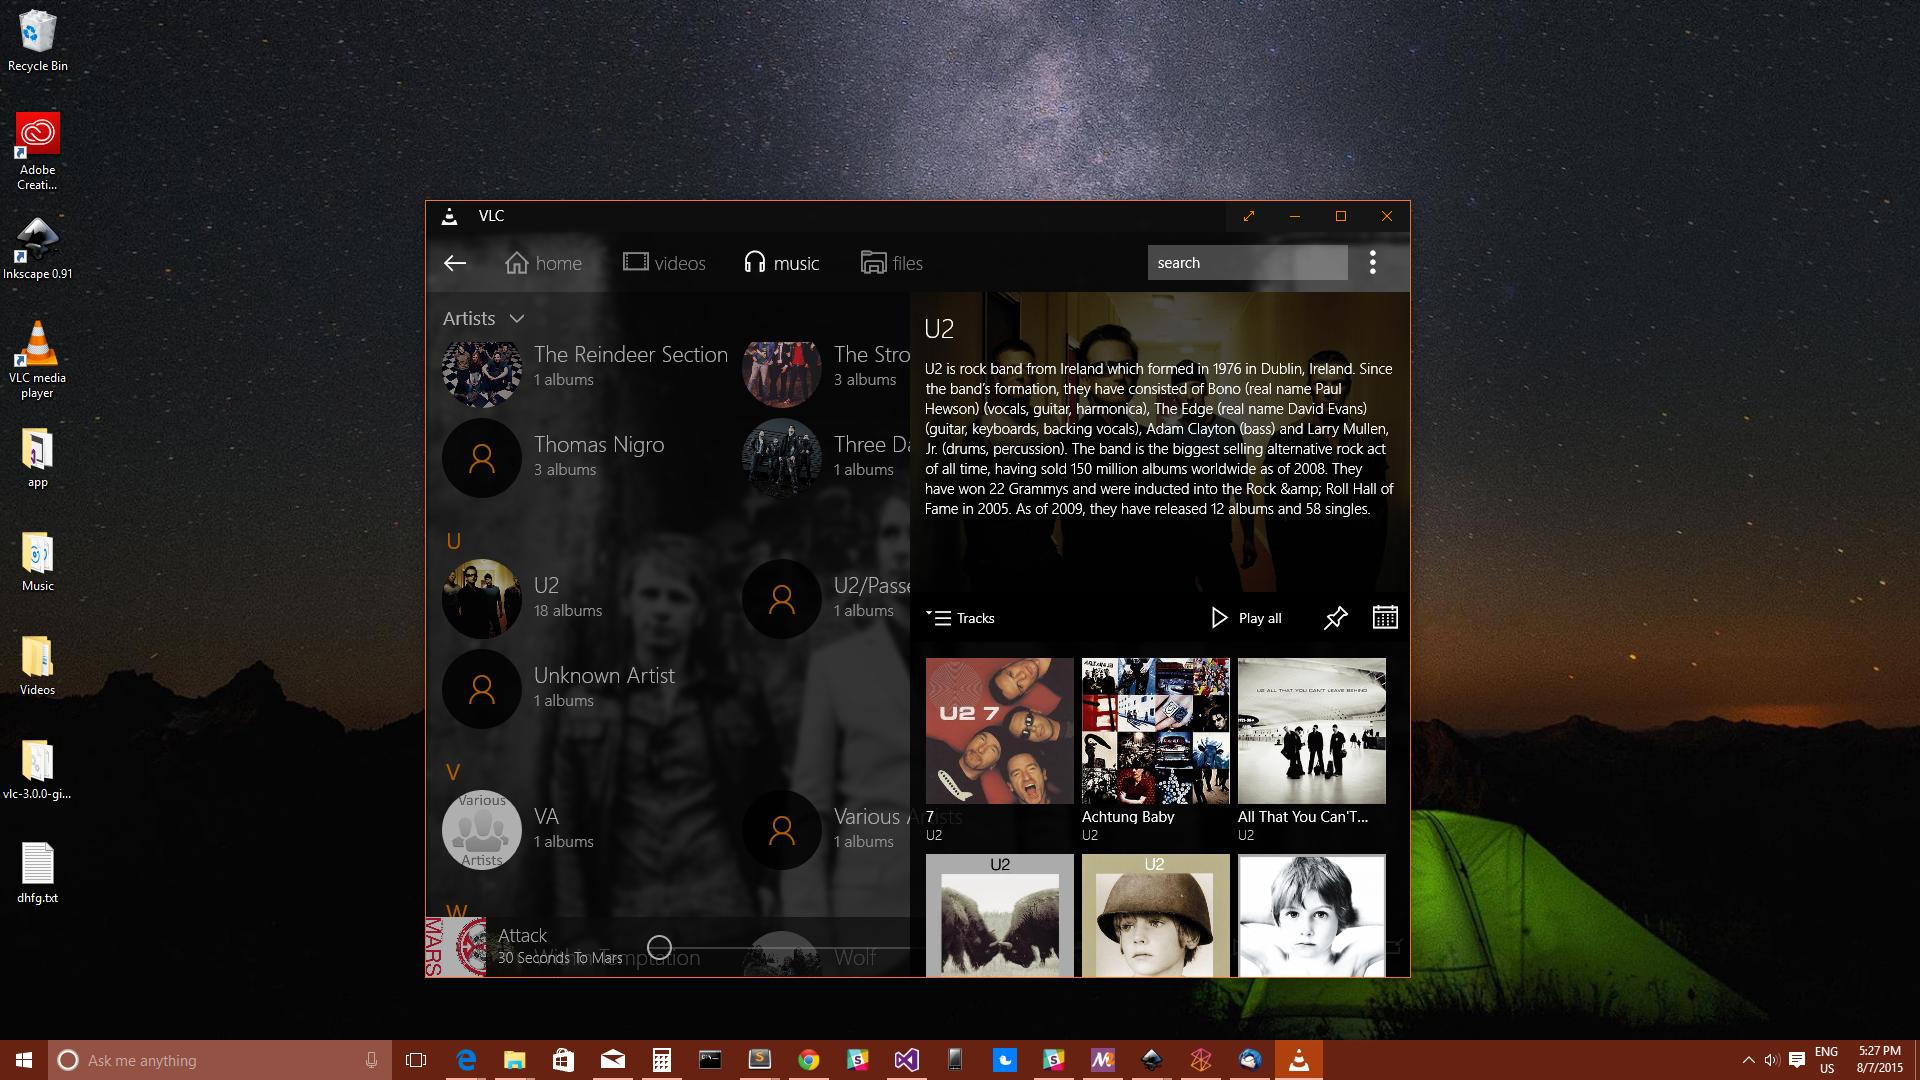 Vlc app f r windows bekommt update neues design neuer - Telecharger table de mixage gratuit windows ...